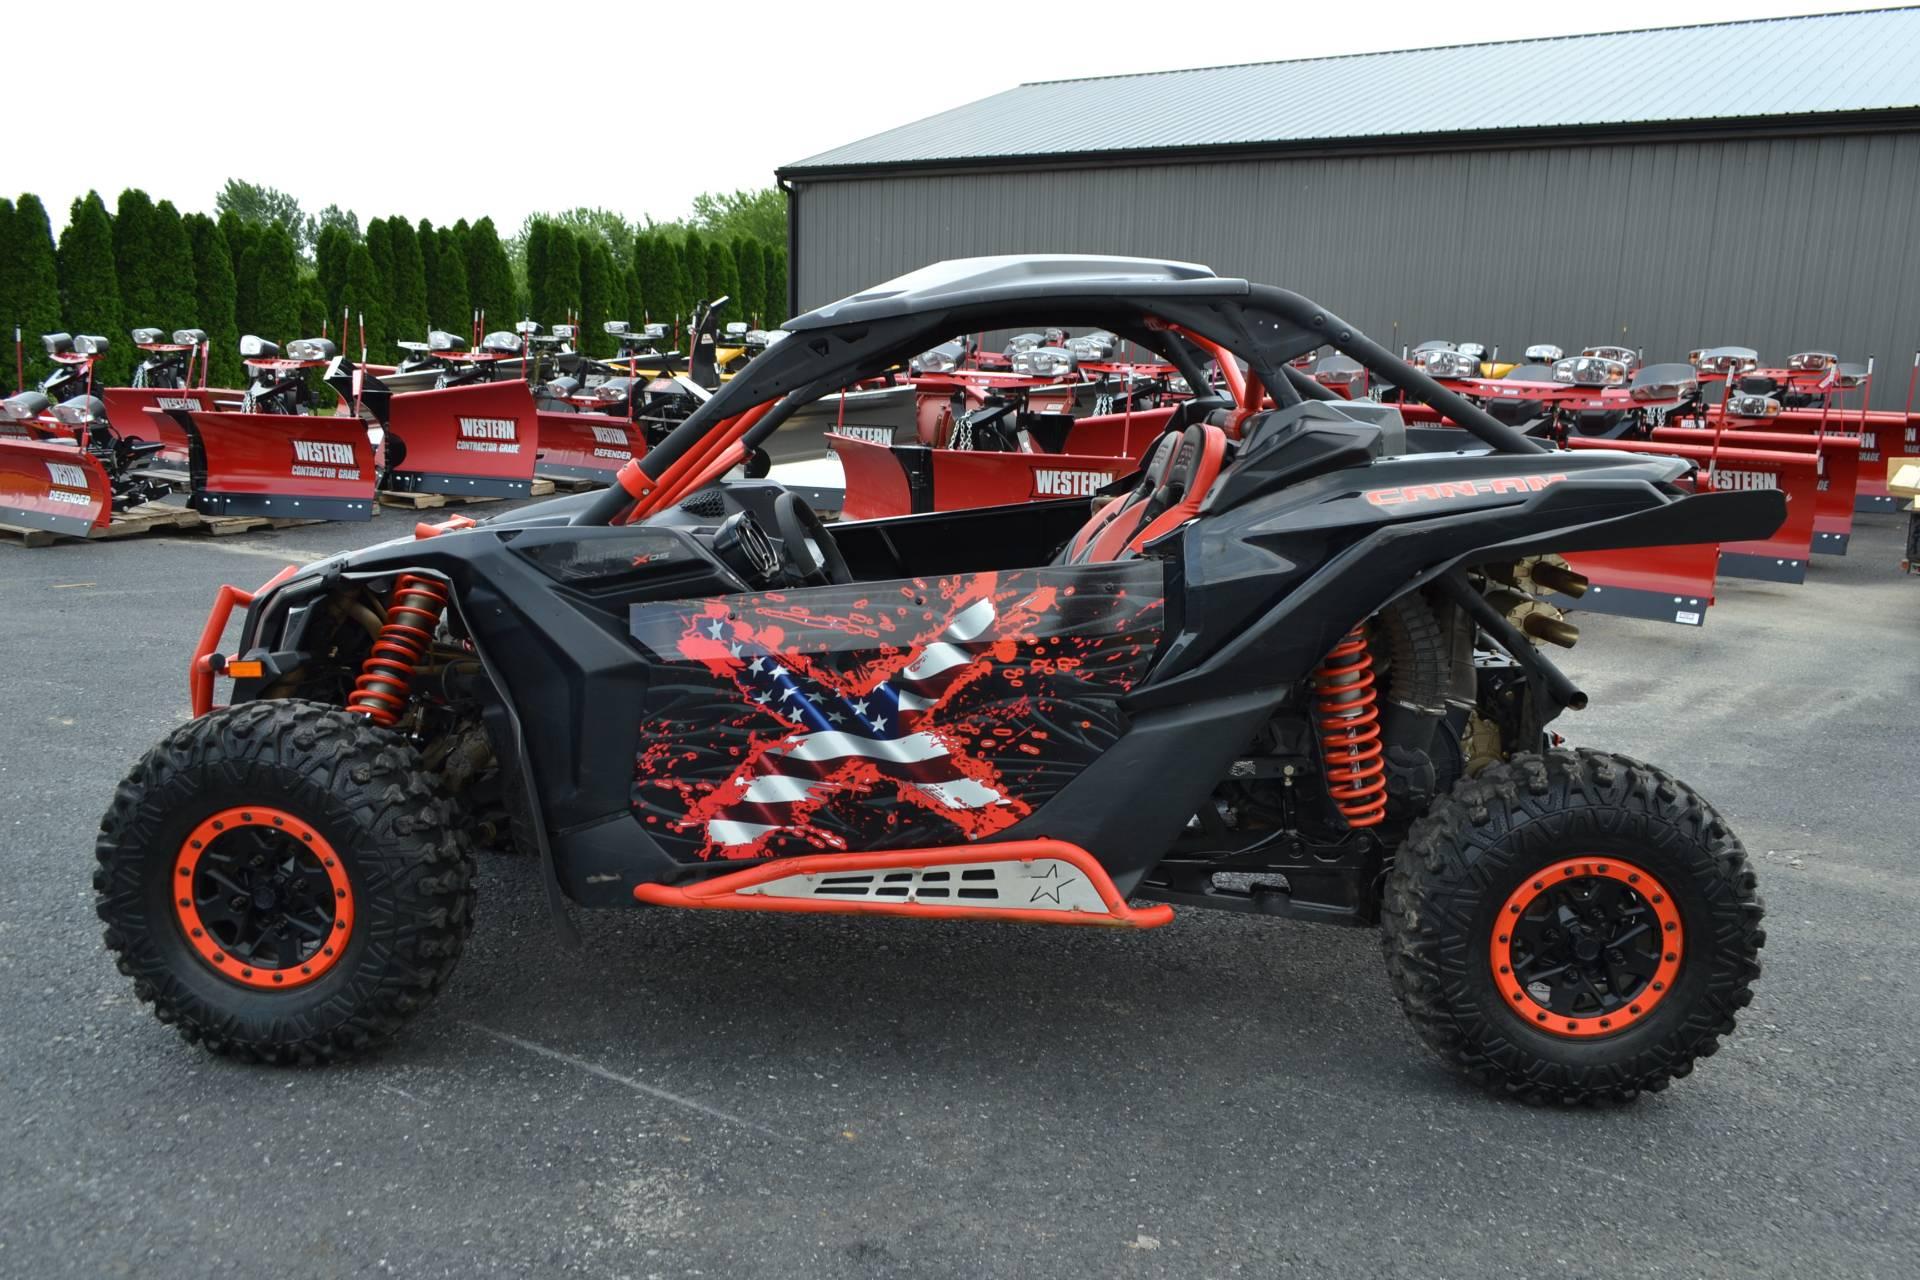 2017 Can-Am™ Maverick X3 X ds Turbo R 9